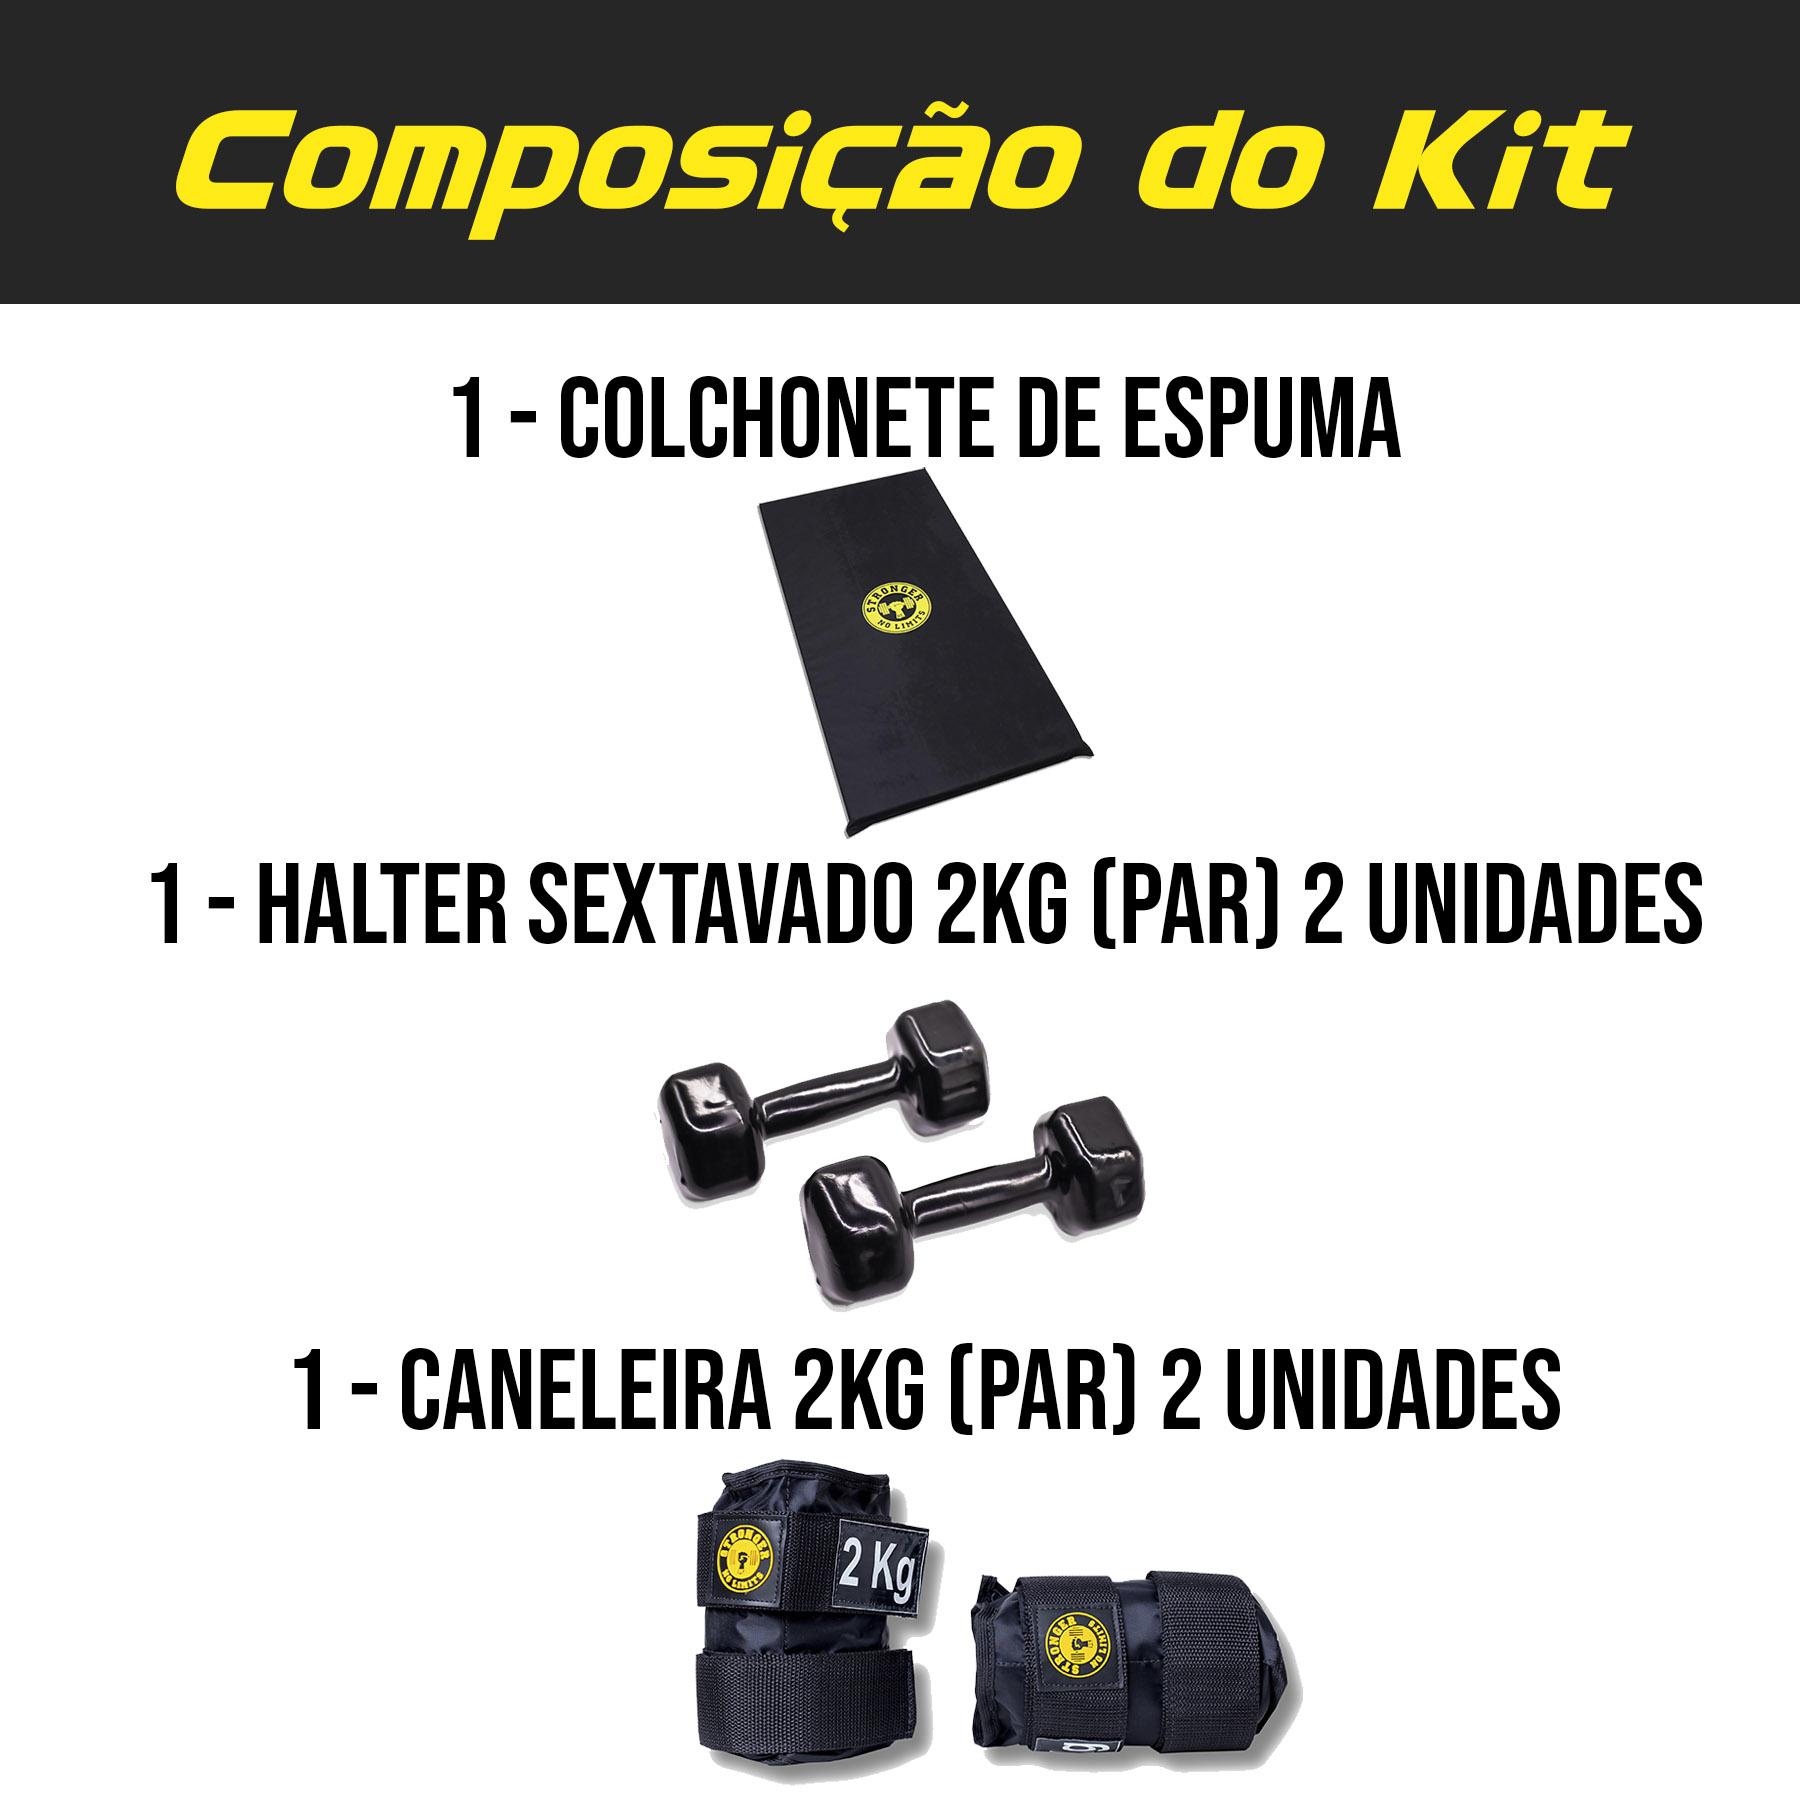 Kit Colchonete Espuma + Halter Dumbbell 2kg + Caneleira de peso 2kg